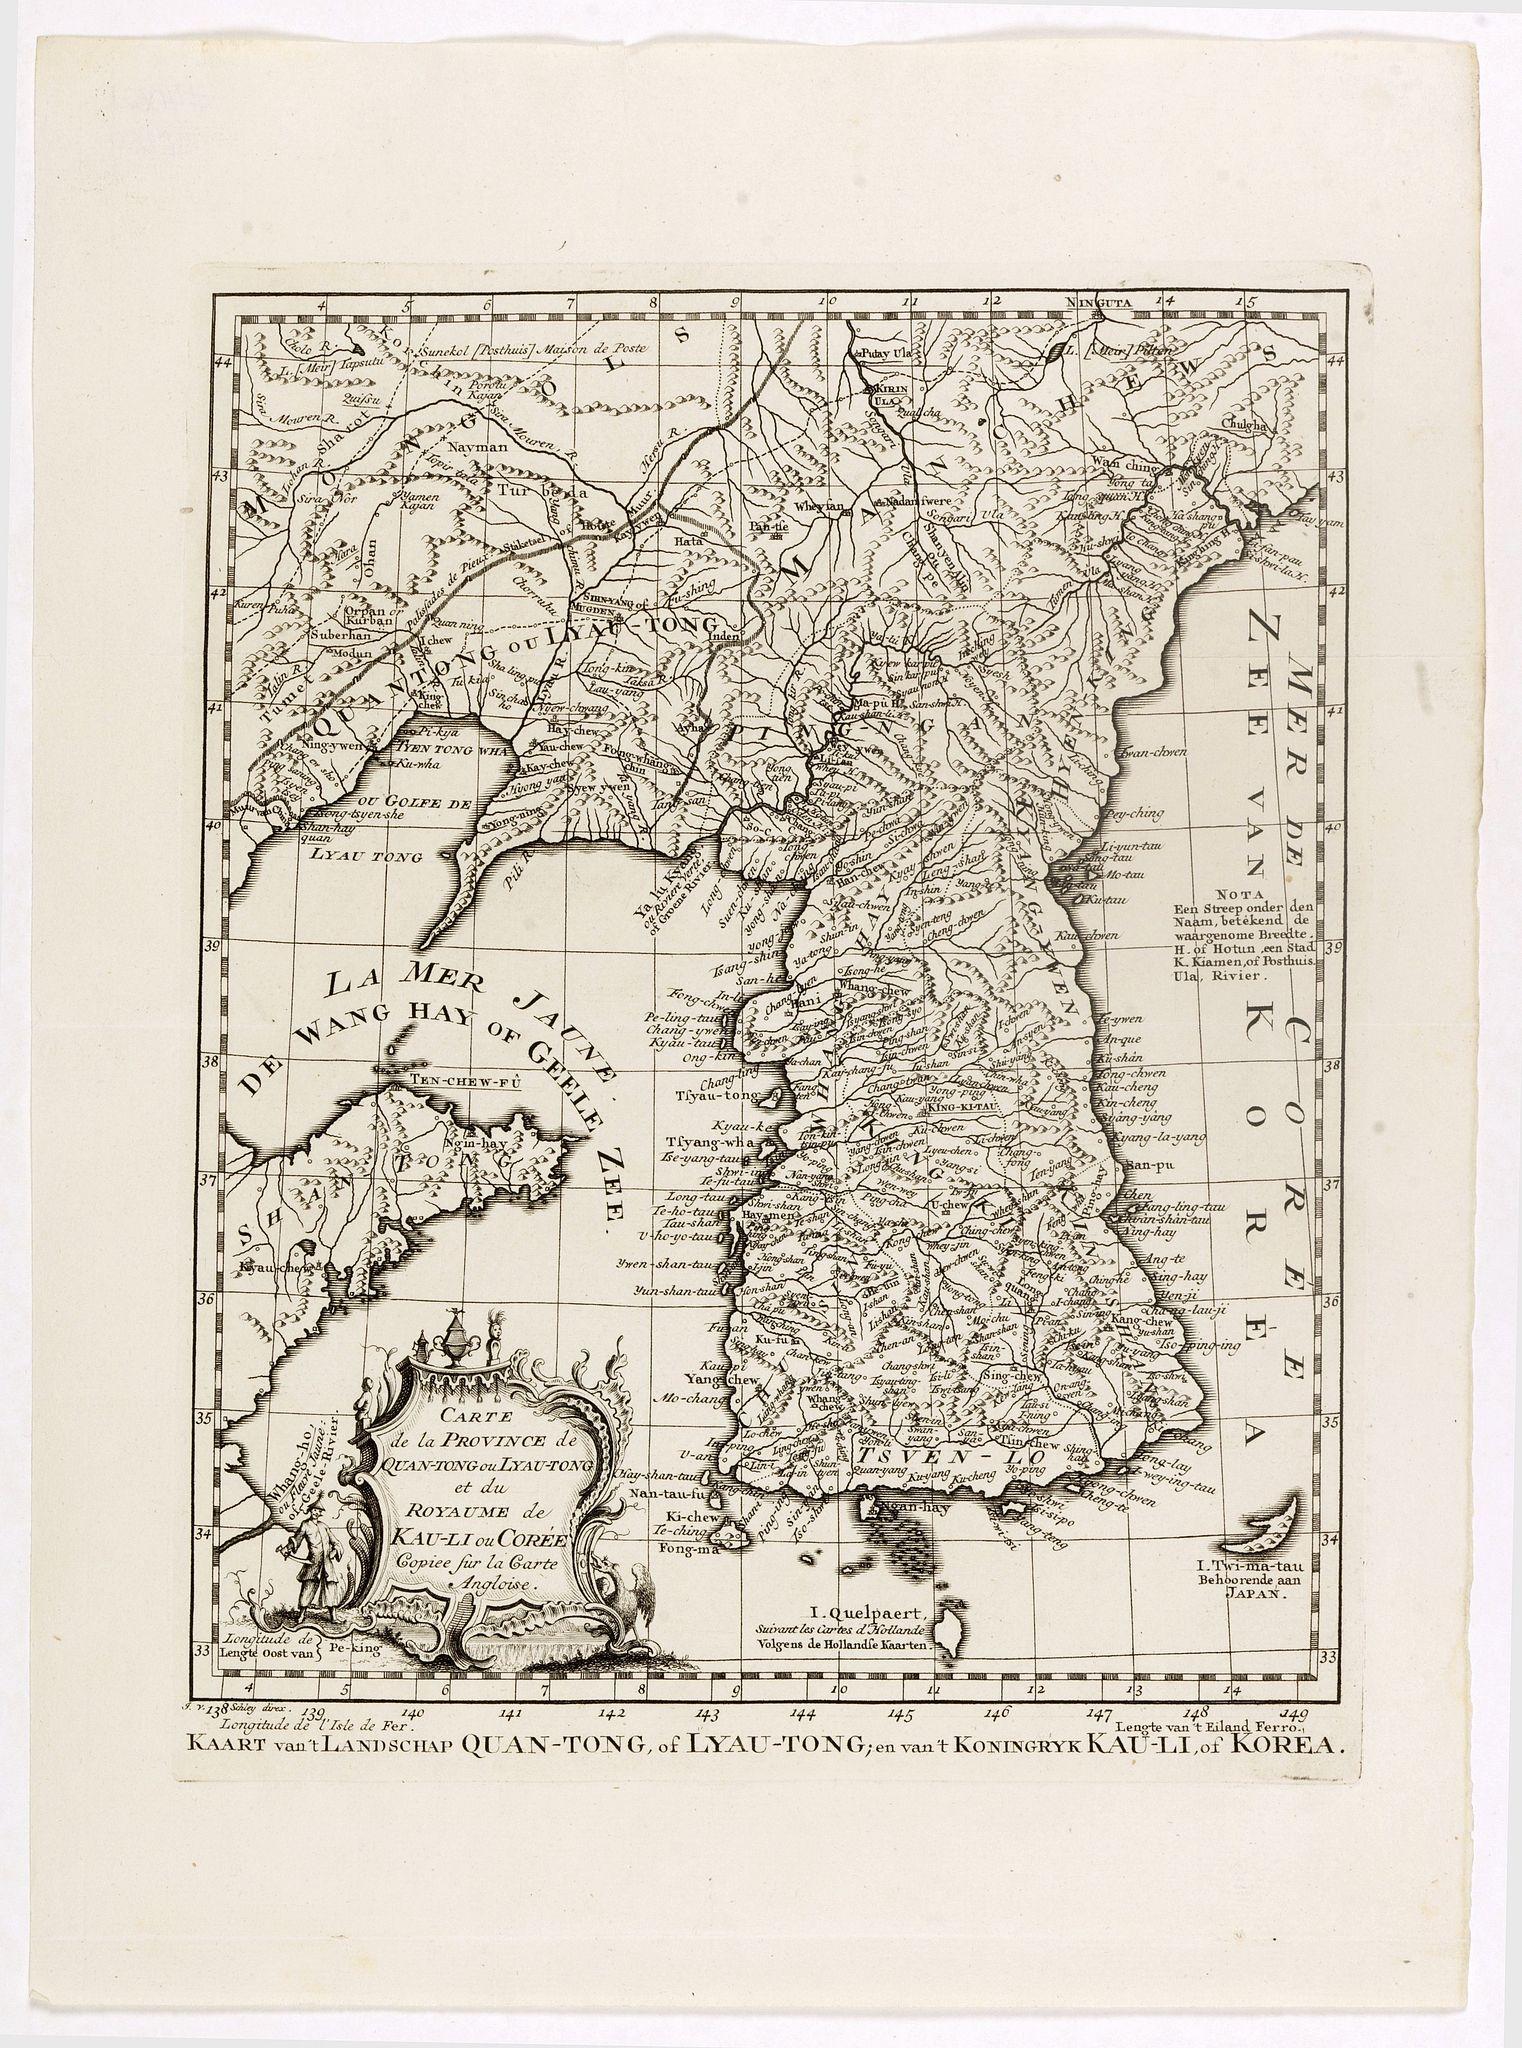 BELLIN, J.N. -  Carte de la province de Quan-tong, ou Lyau-tong et du Royaume de Kau-li ou Corée. . . / Kaart van t' Landschap Quan-Tong . . .